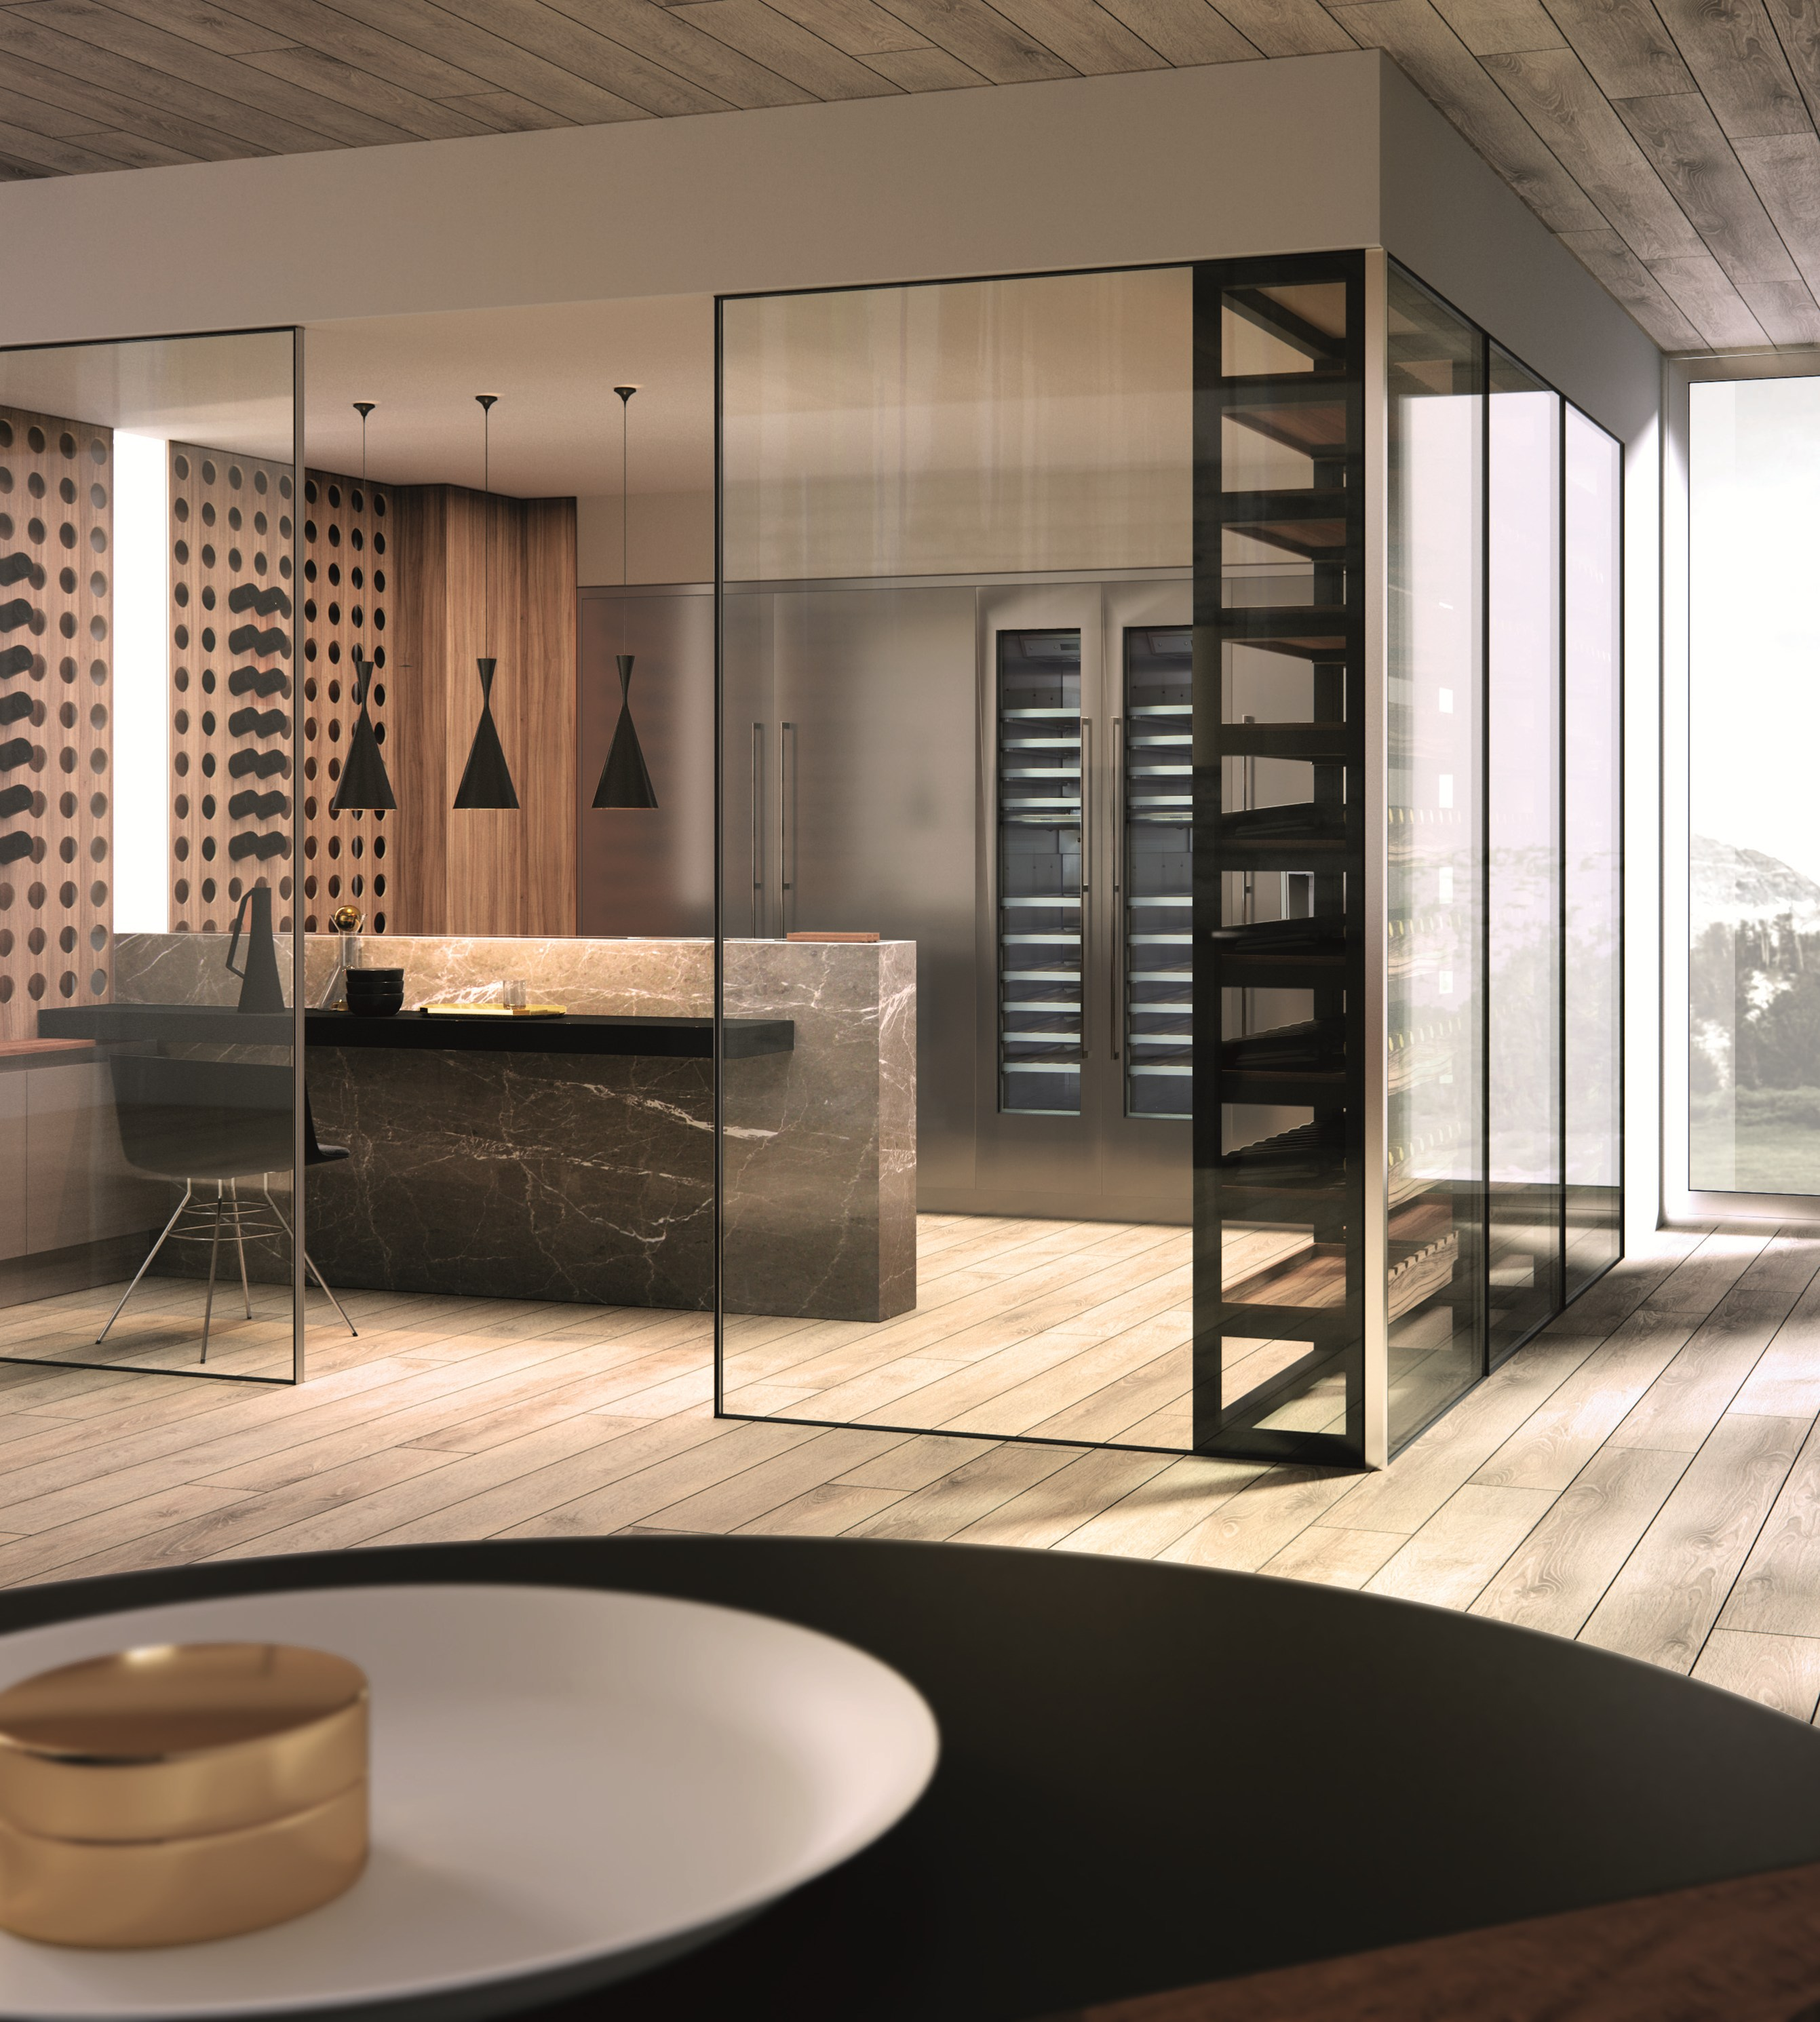 domina kitchen with peninsula by aster cucine design lorenzo